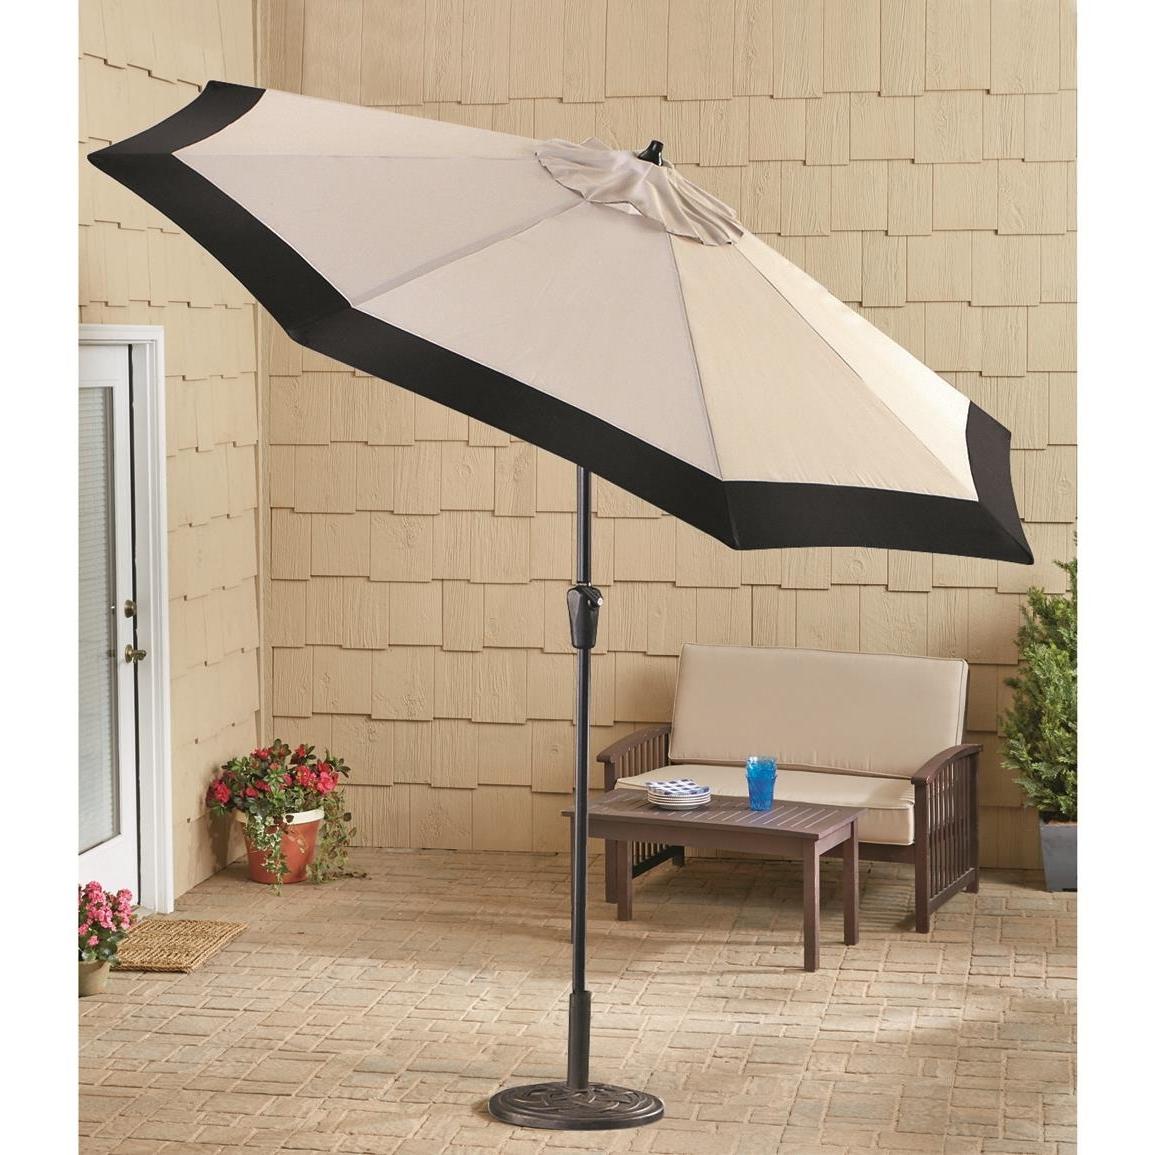 2019 Deluxe Patio Umbrellas Throughout Castlecreek 9' Two Tone Deluxe Market Patio Umbrella, Khaki / Black (View 2 of 20)